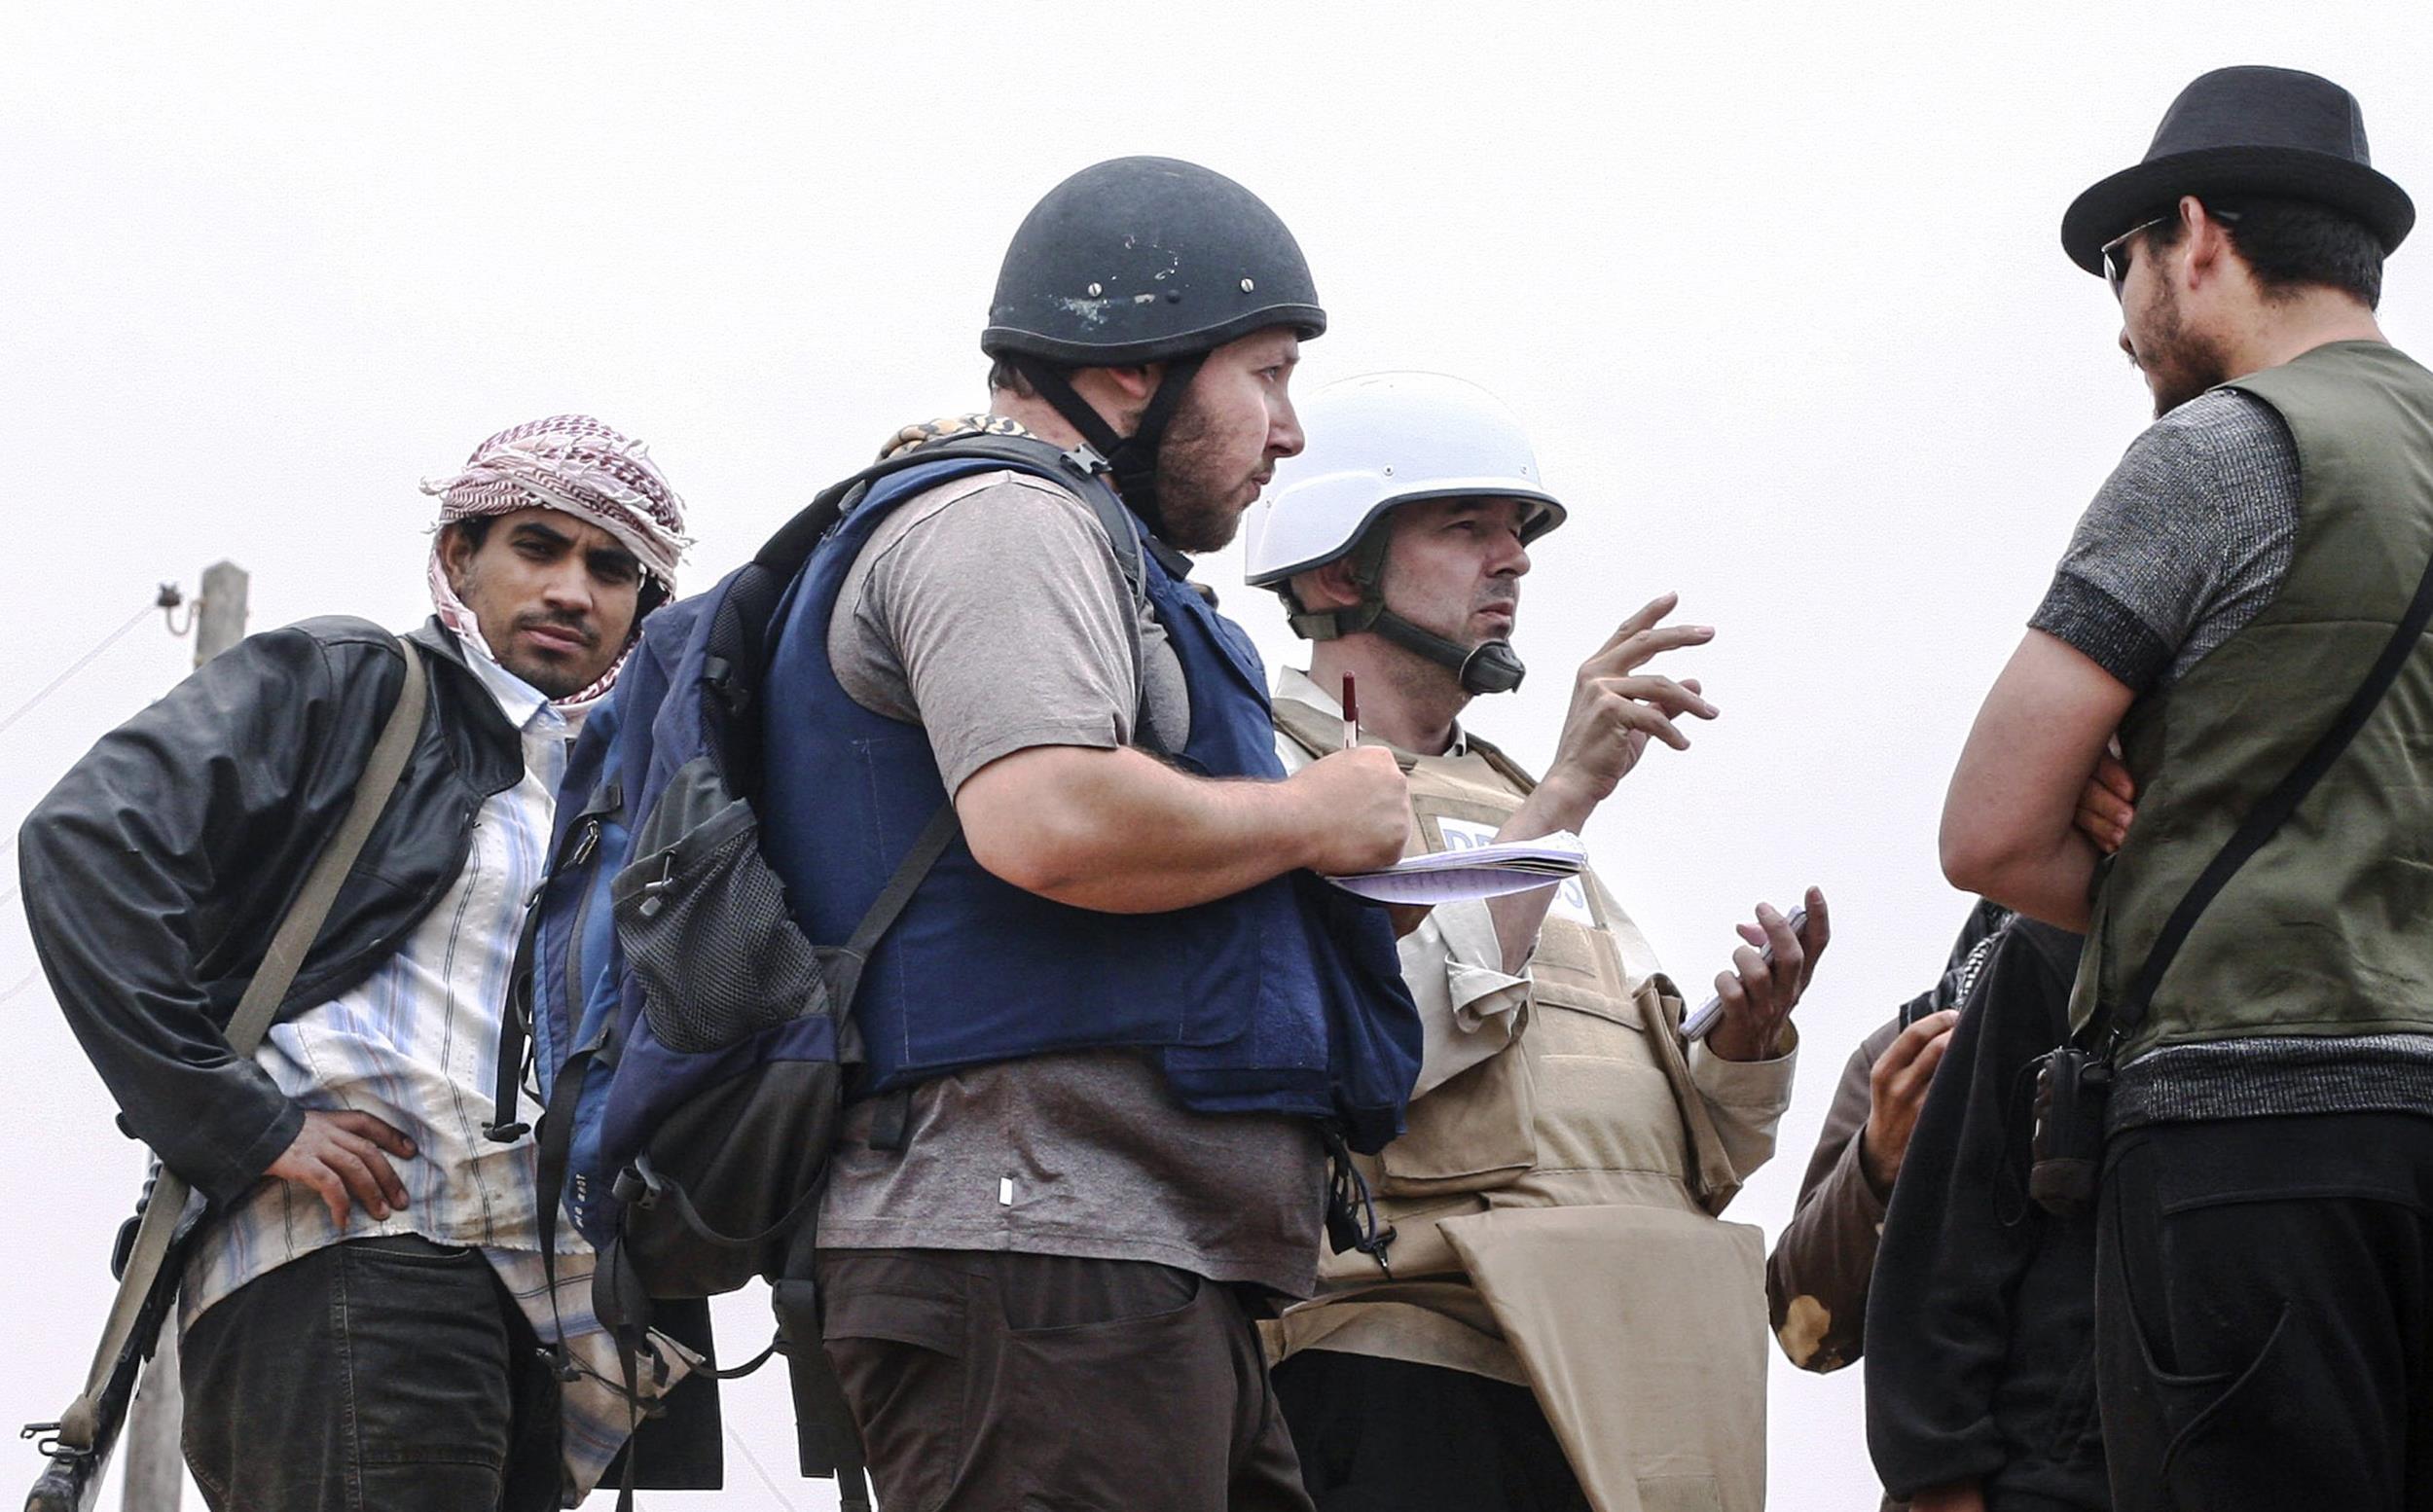 Image: American journalist Steven Sotloff